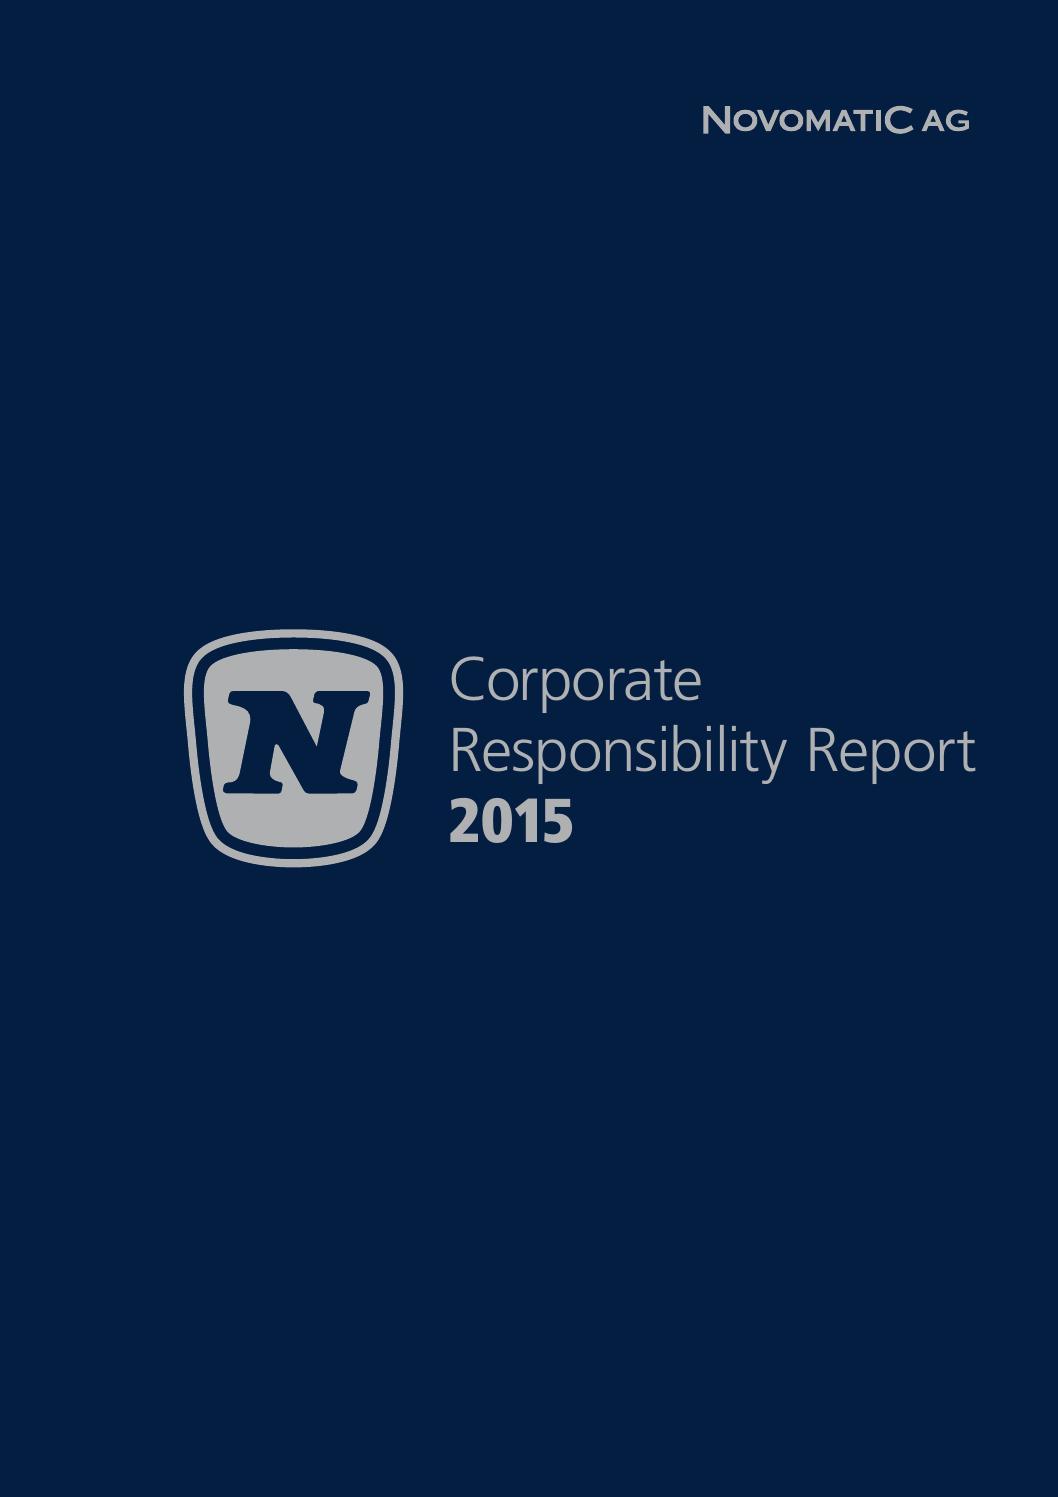 NOVOMATIC CR Bericht 2015 by NOVOMATIC Gaming Industries - issuu